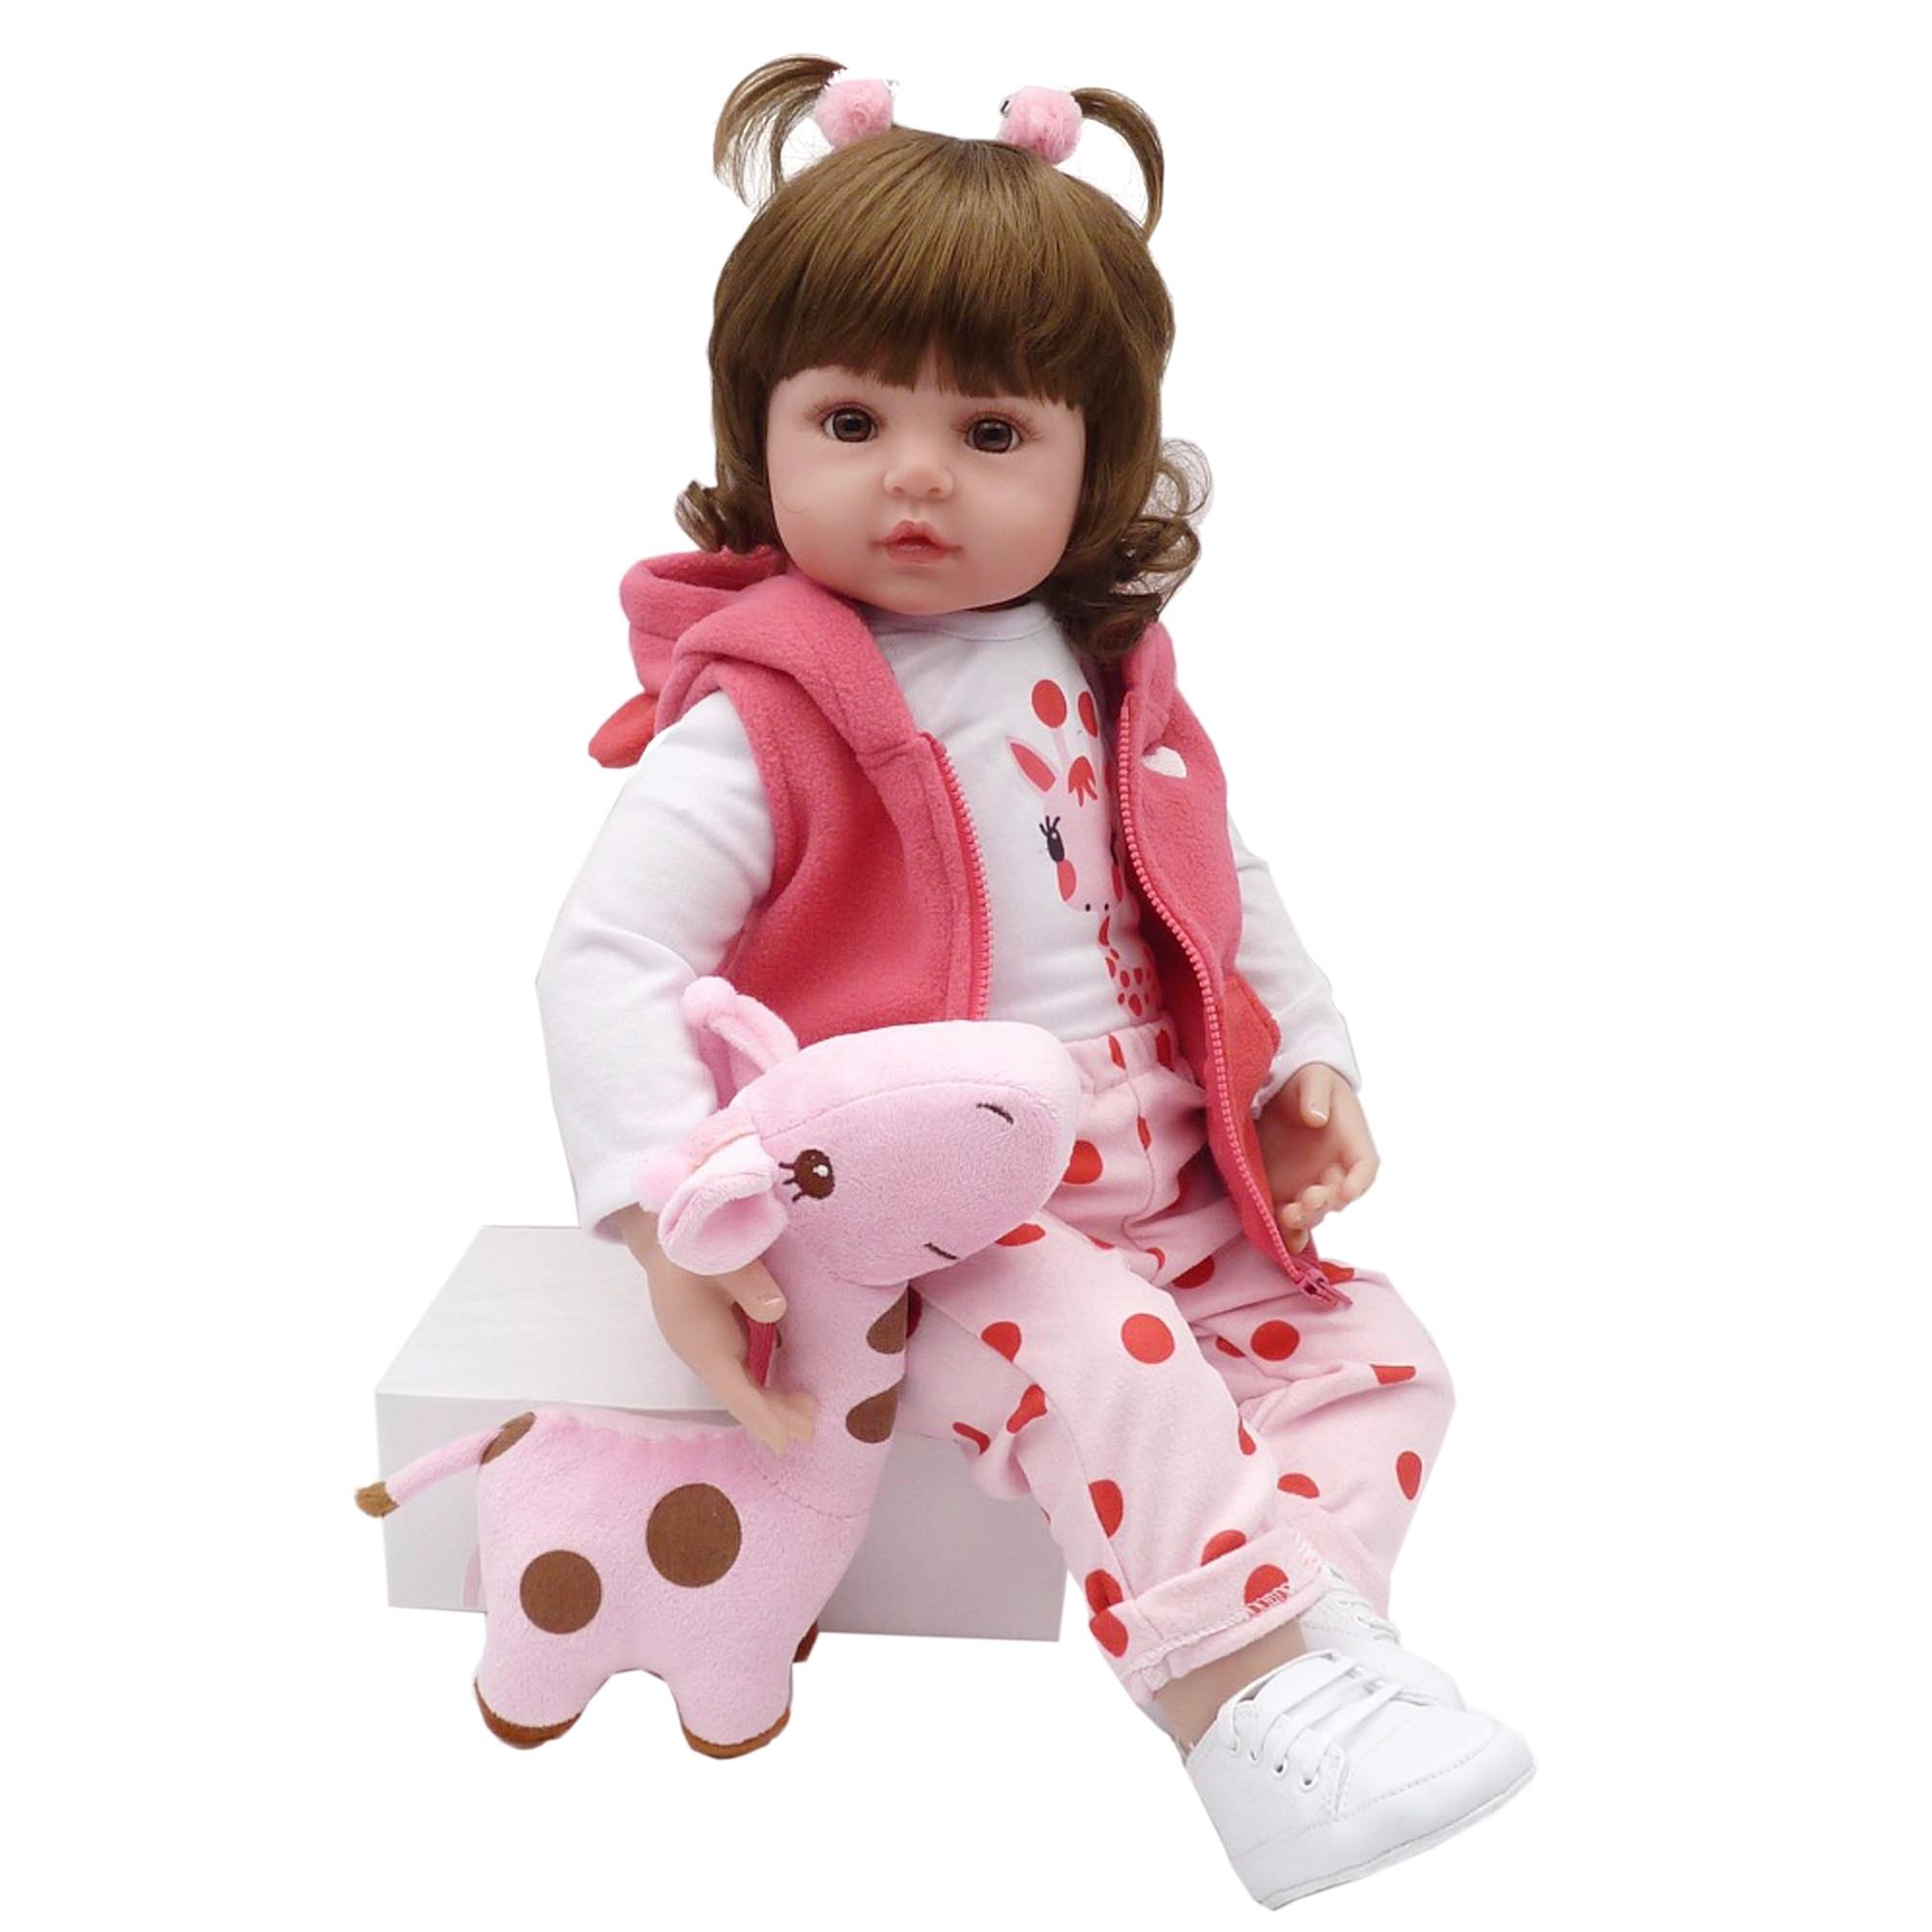 60cm Soft Silicone Reborn Baby Doll Toys Like Real Bebe Princess Toddler Birthday Gift Fashion Birthday Present Girls Bonecas